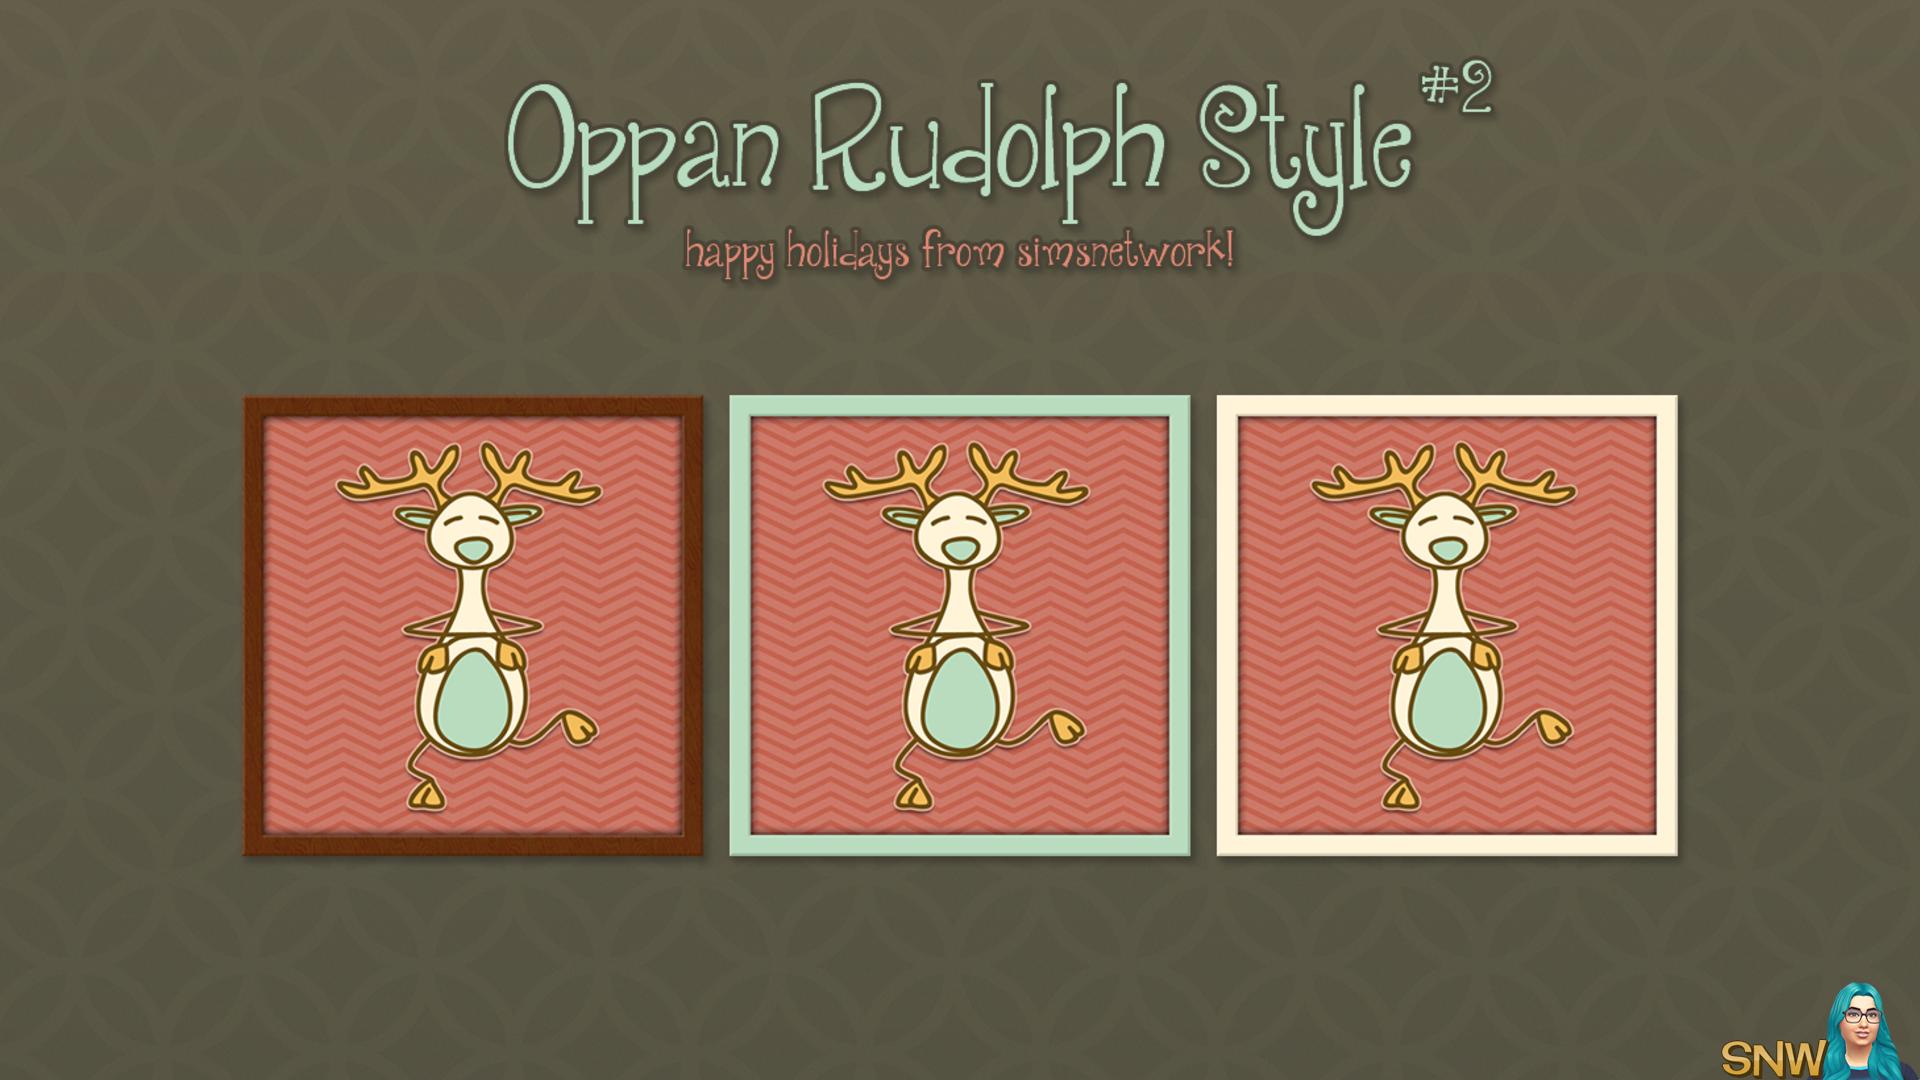 Oppan Rudolph Style #2